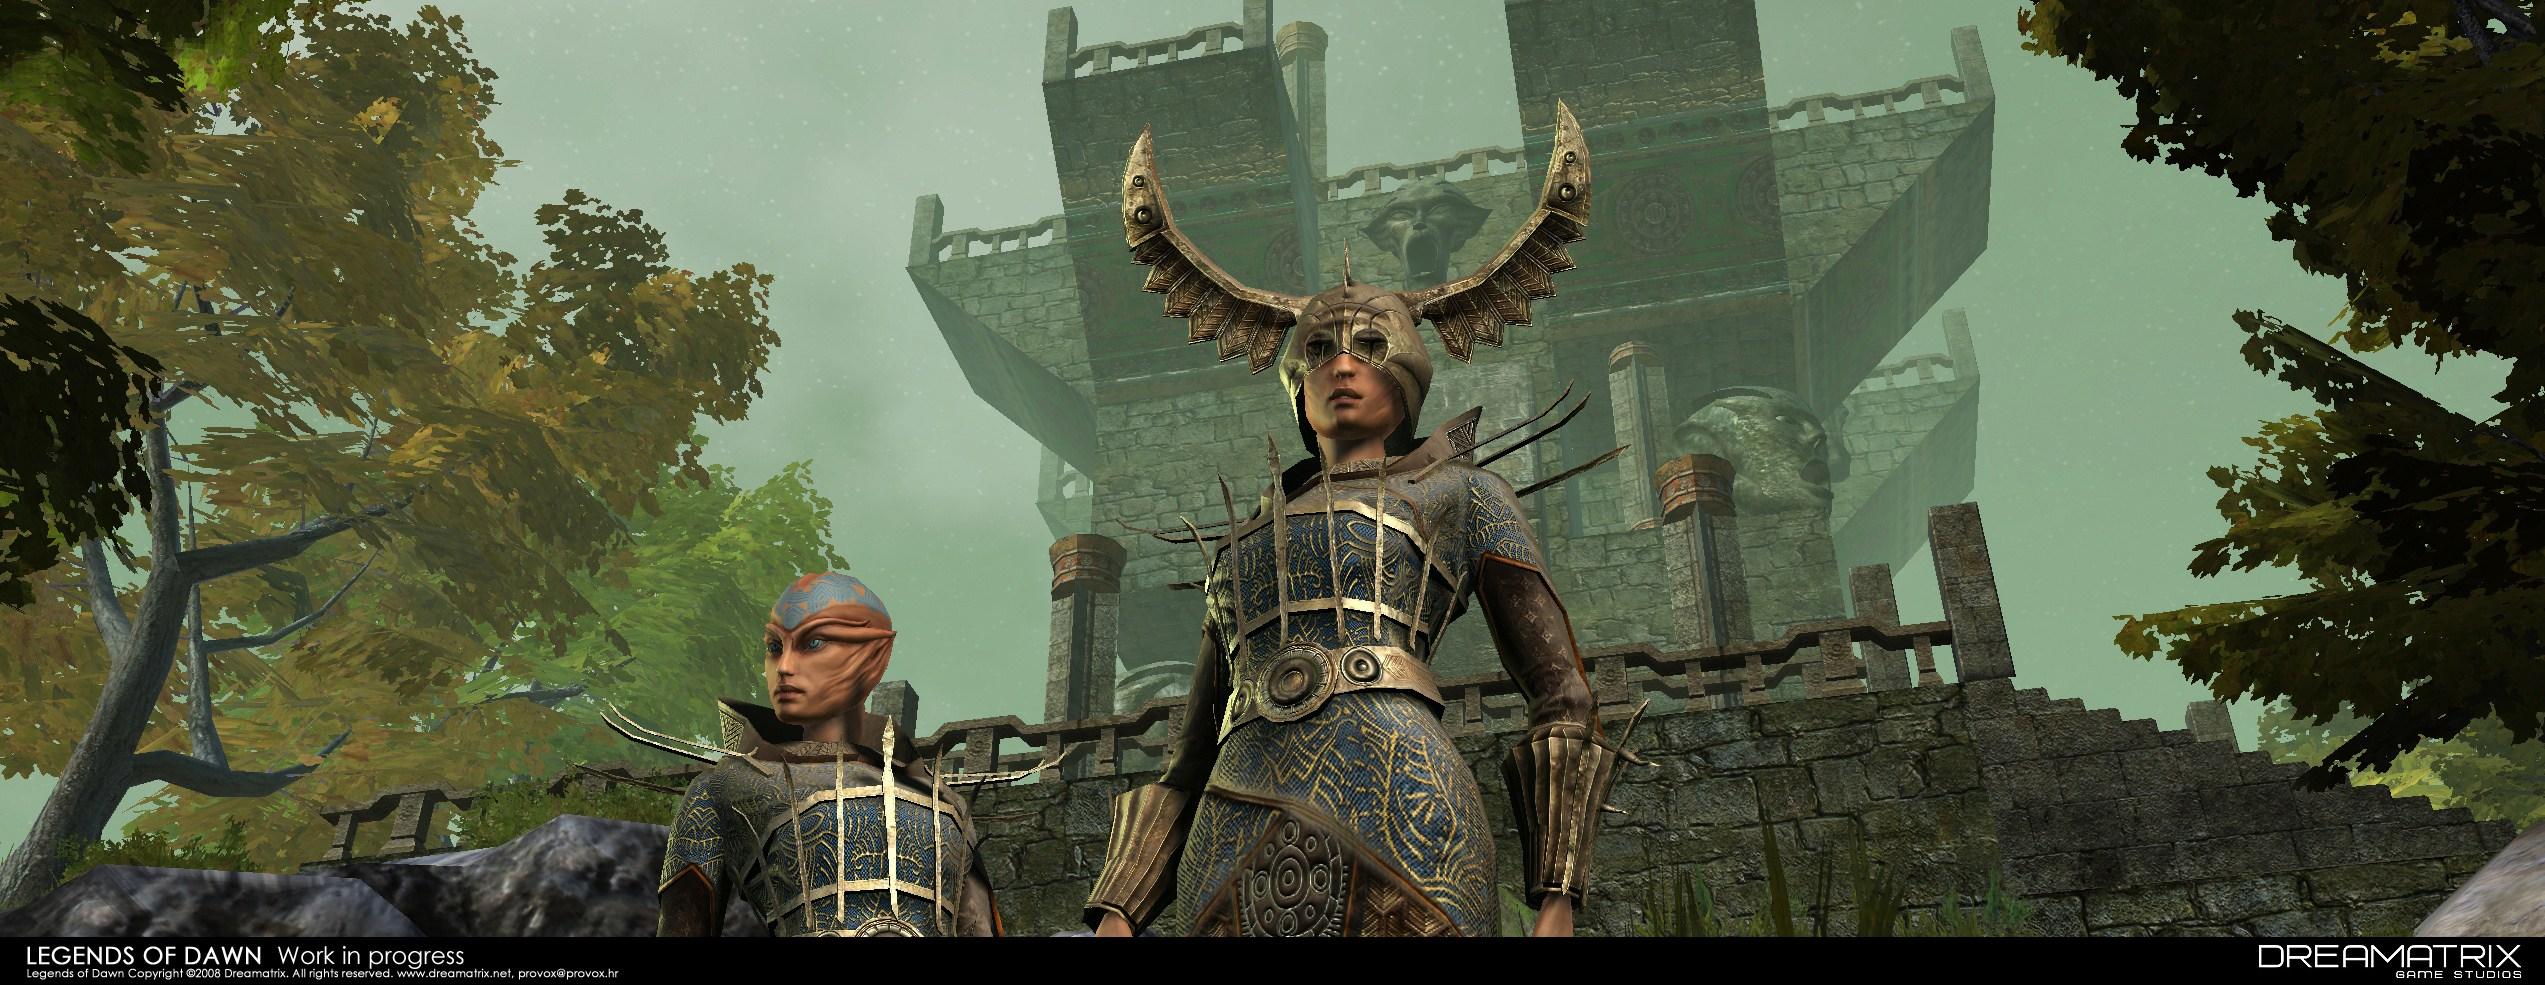 Oznámeno fantasy RPG Legends of Dawn 67024